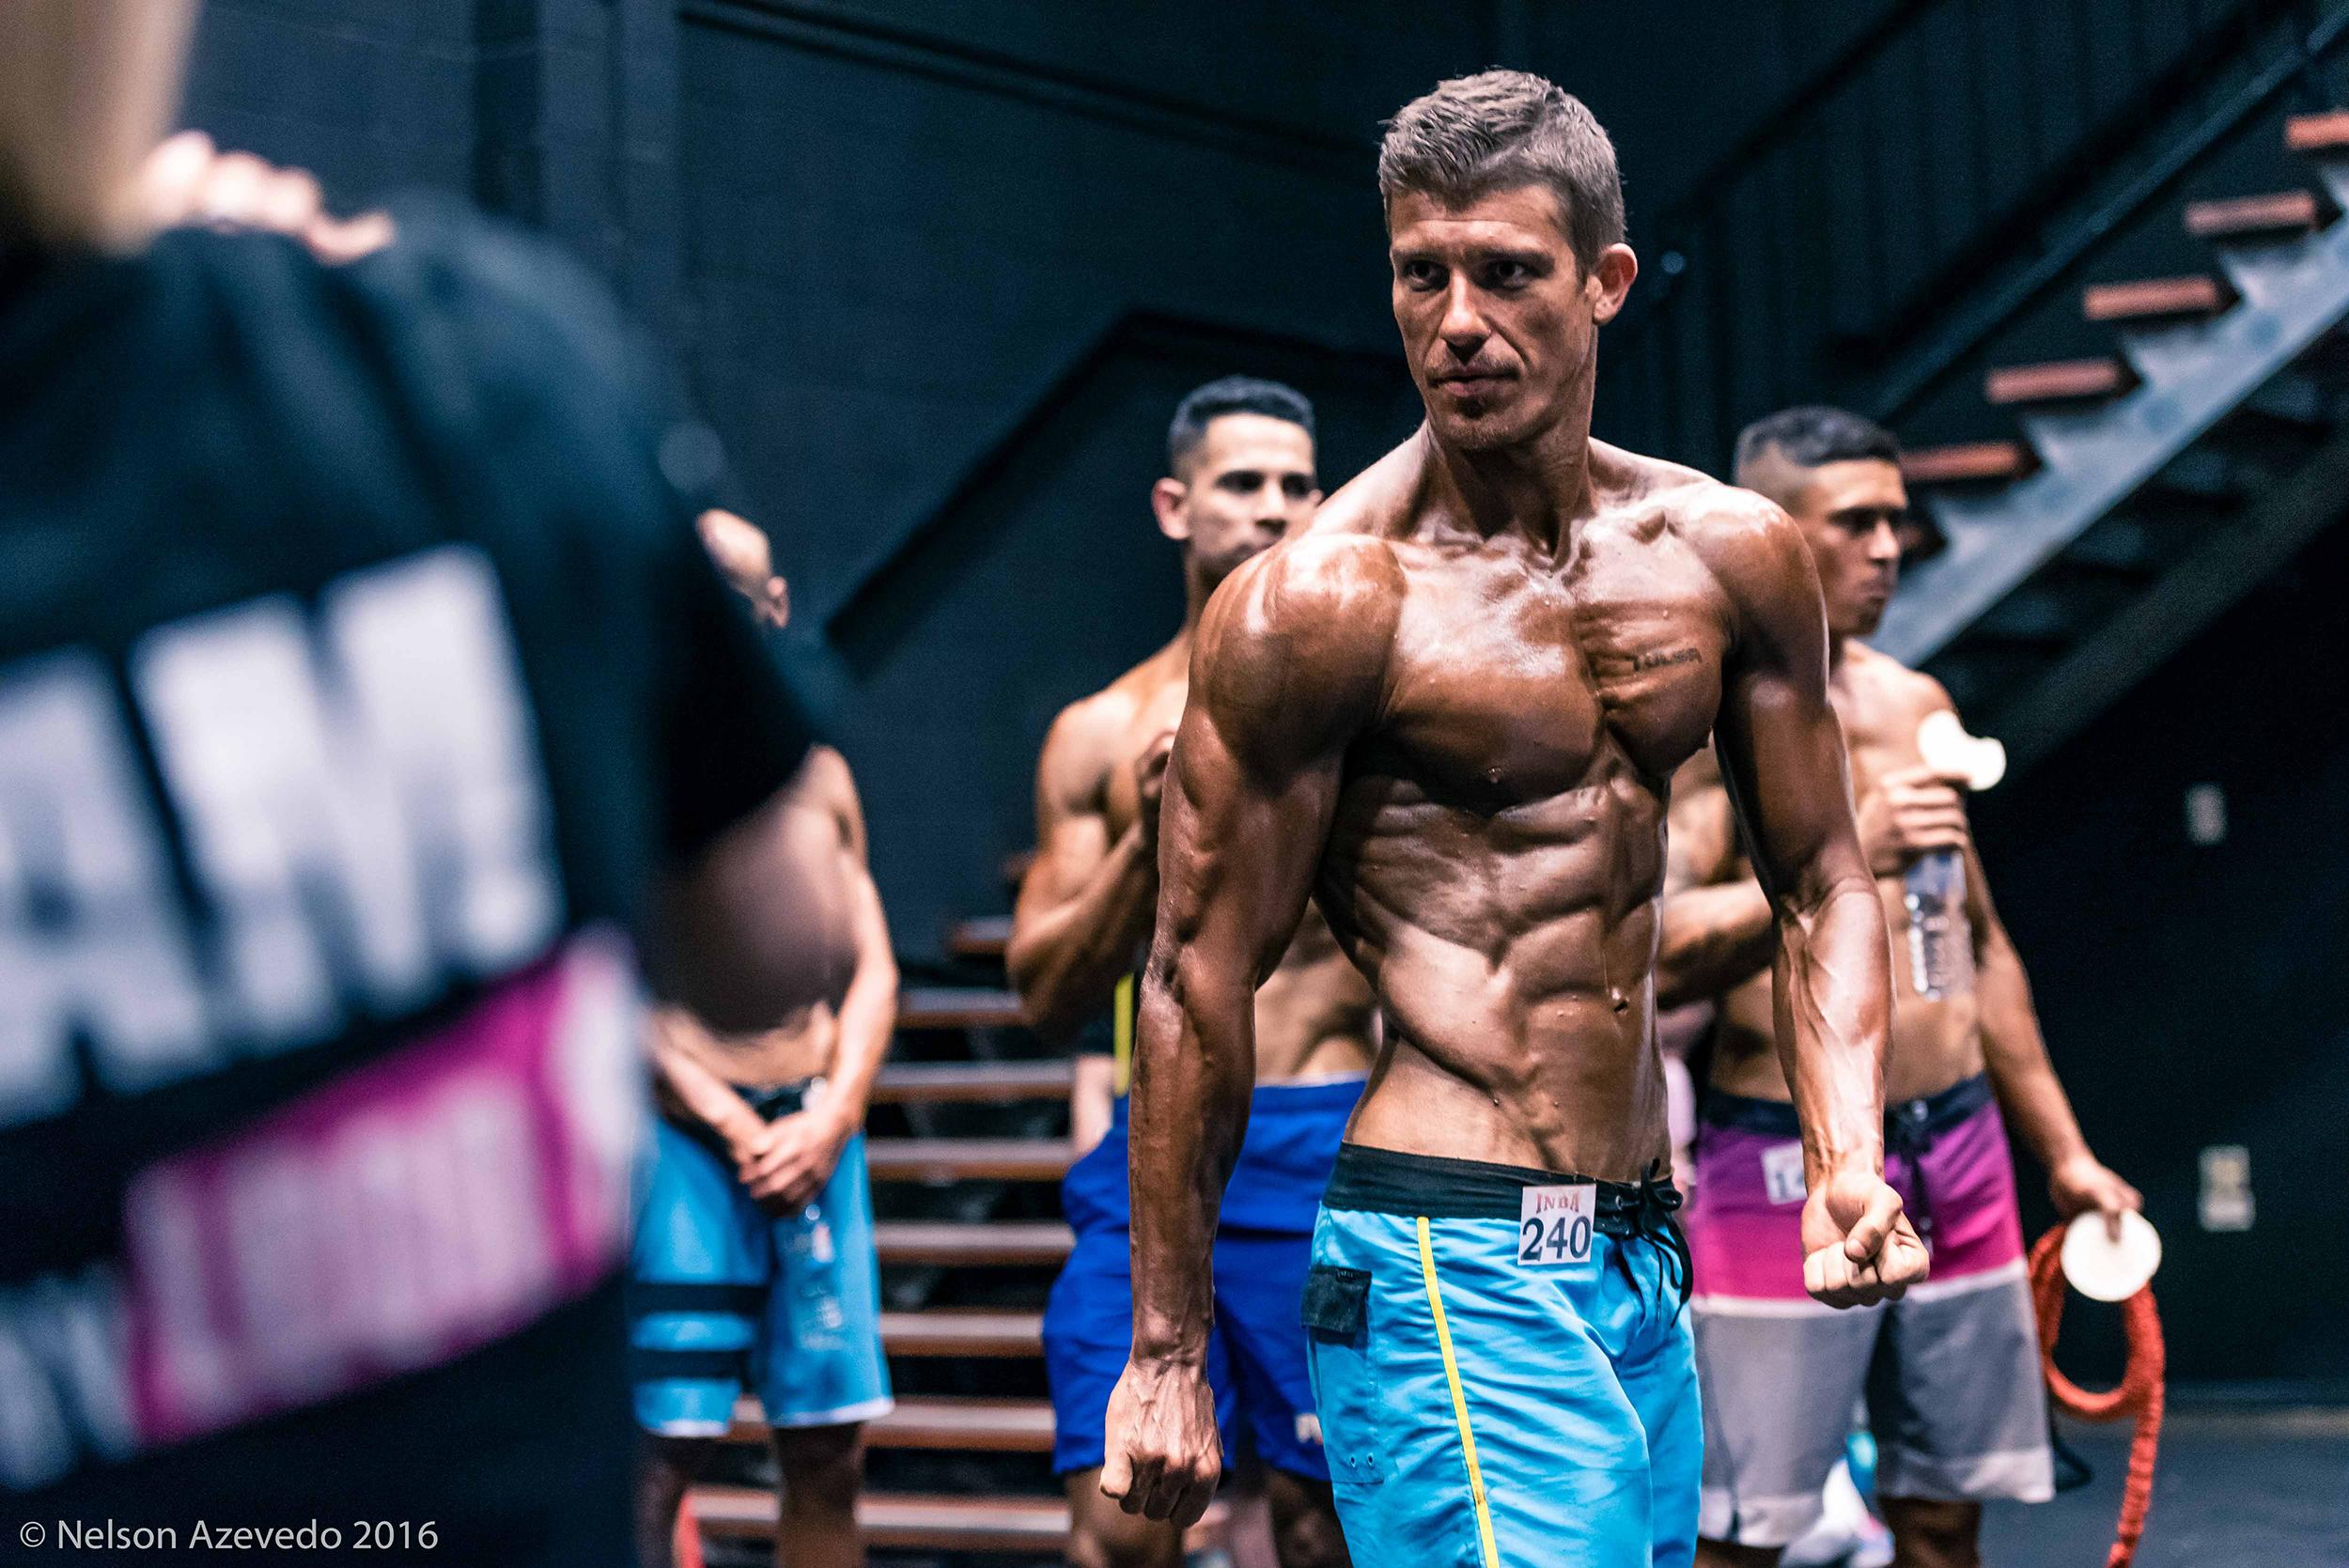 Body Building Show Coach 1.jpg